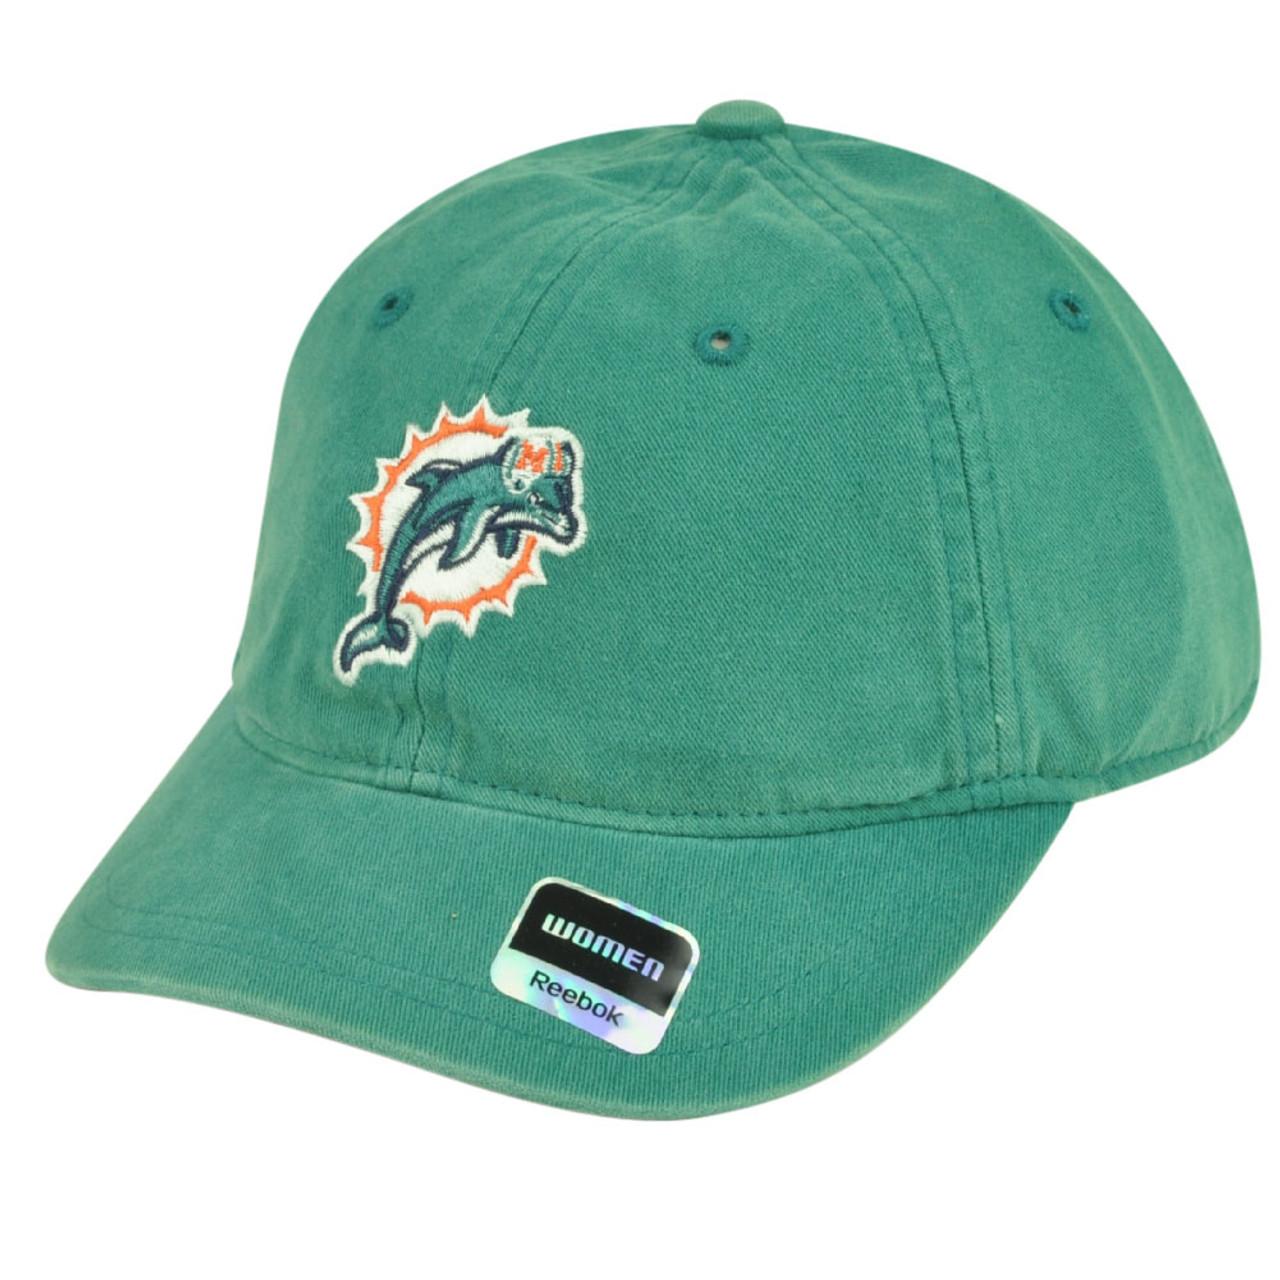 NFL Miami Dolphins Reebok Womens Garment Wash Clip Buckle Hat Cap Relaxed  Rbk - Sinbad Sports Store 45c1f7cdb8